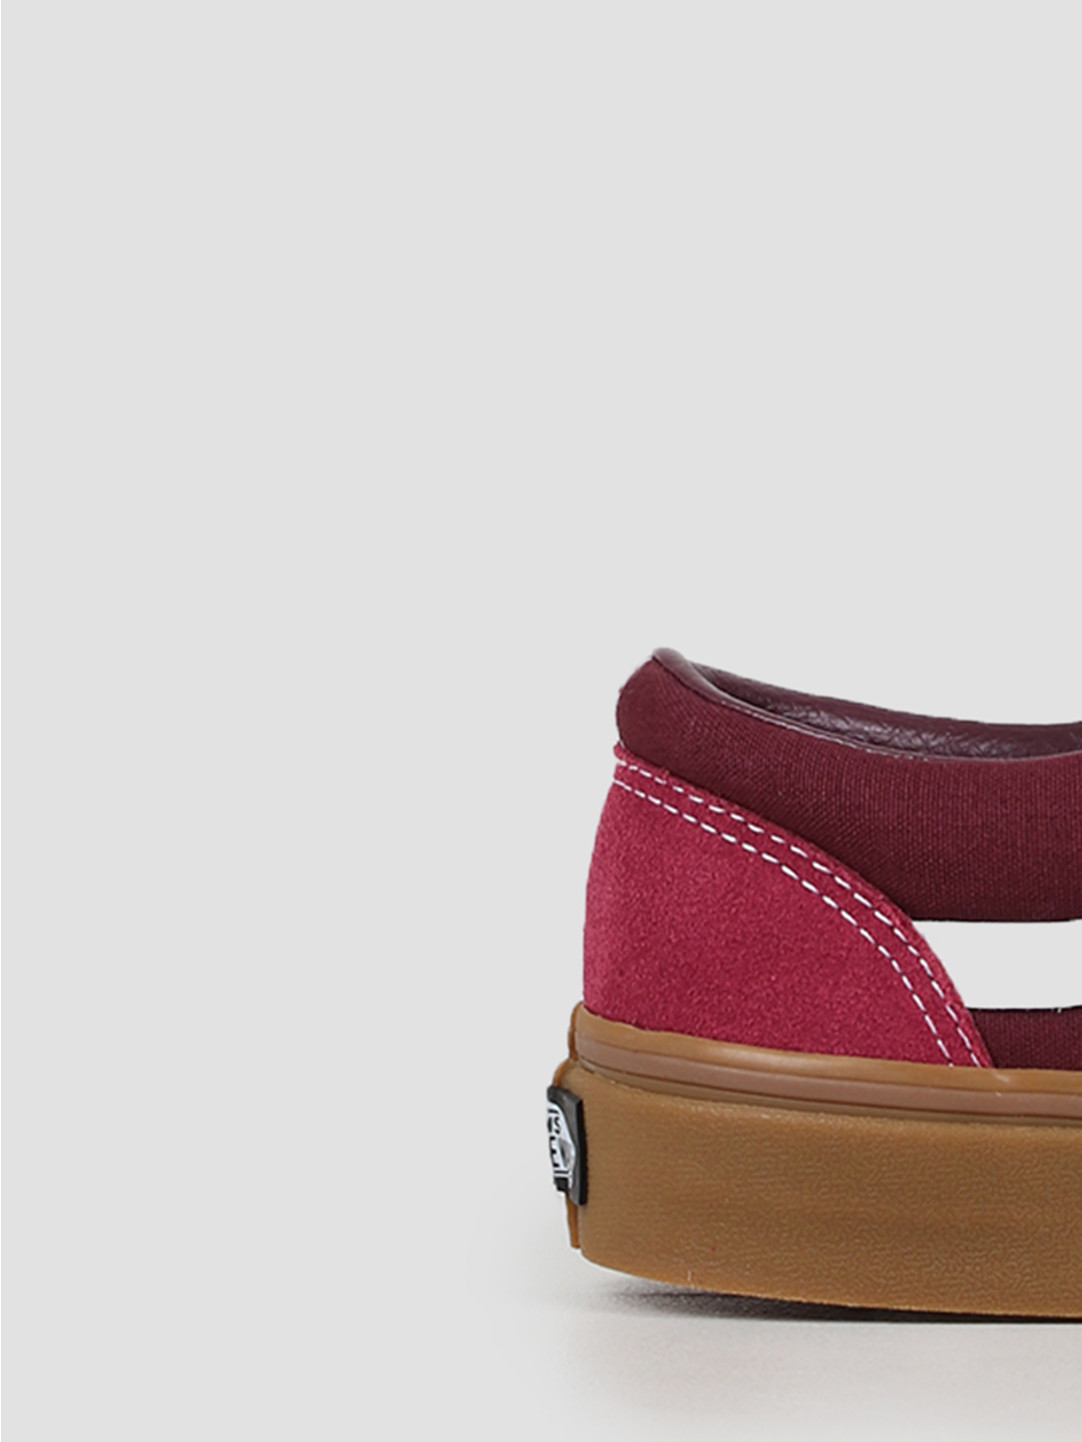 Vans Vans Style 36 Gum Beet Red Port Royale VN0A3DZ3T651